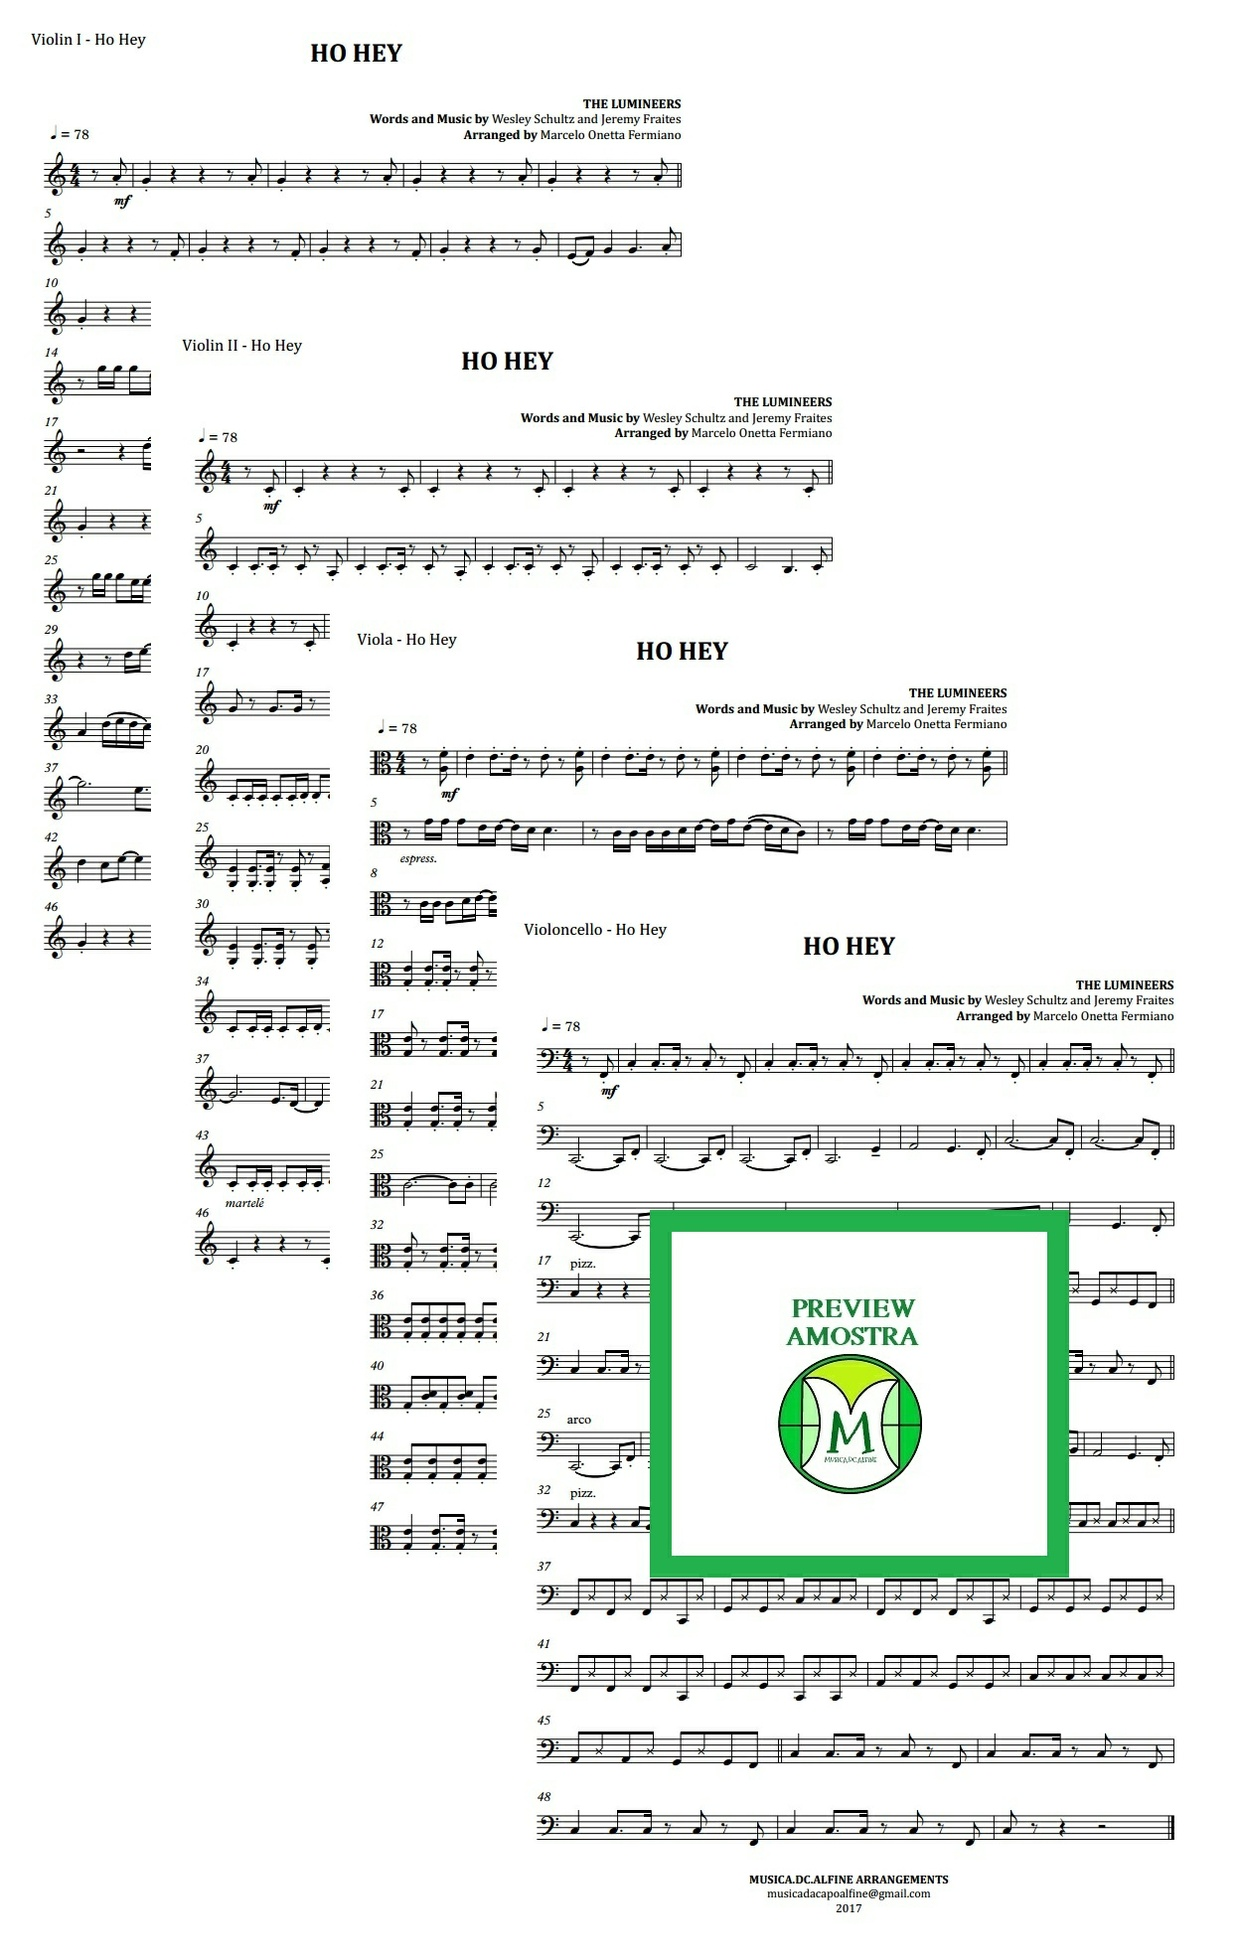 Ho Hey | The Lumineers | Quarteto de Cordas | Partitura Completa Download